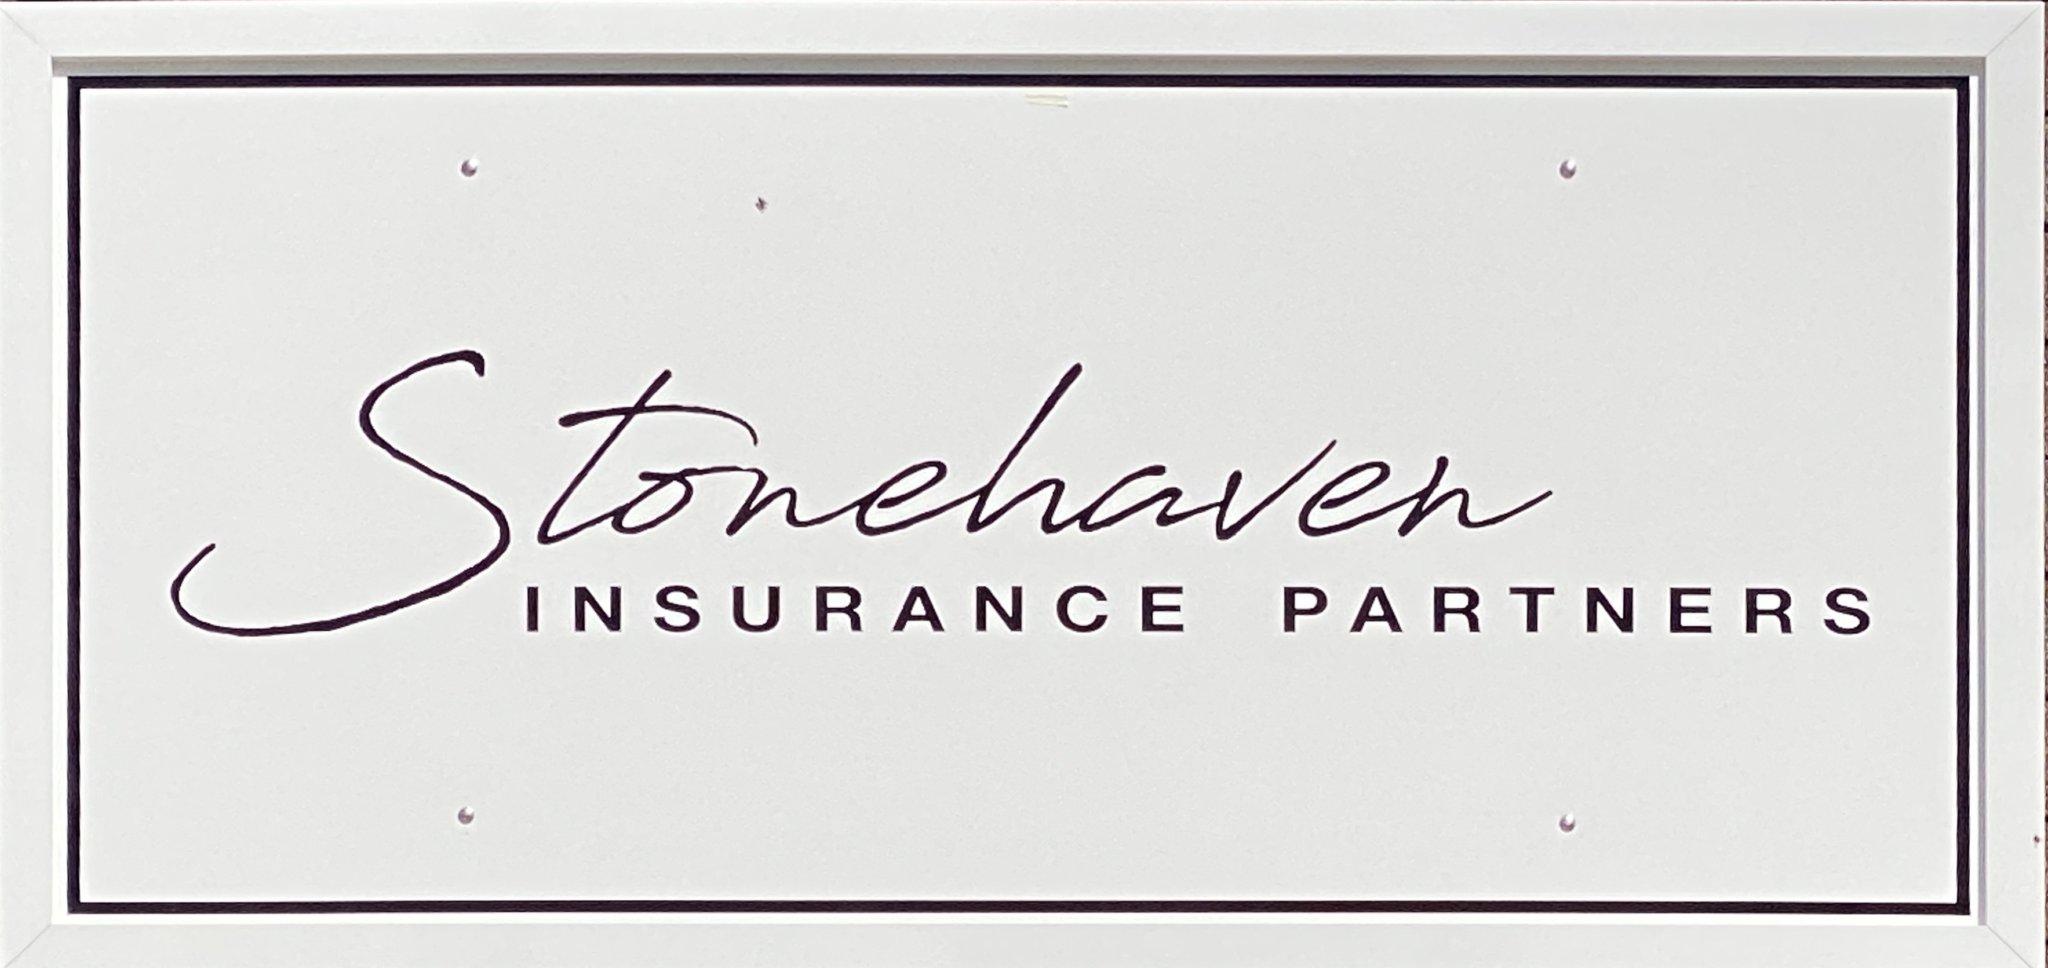 Stonehaven Insurance